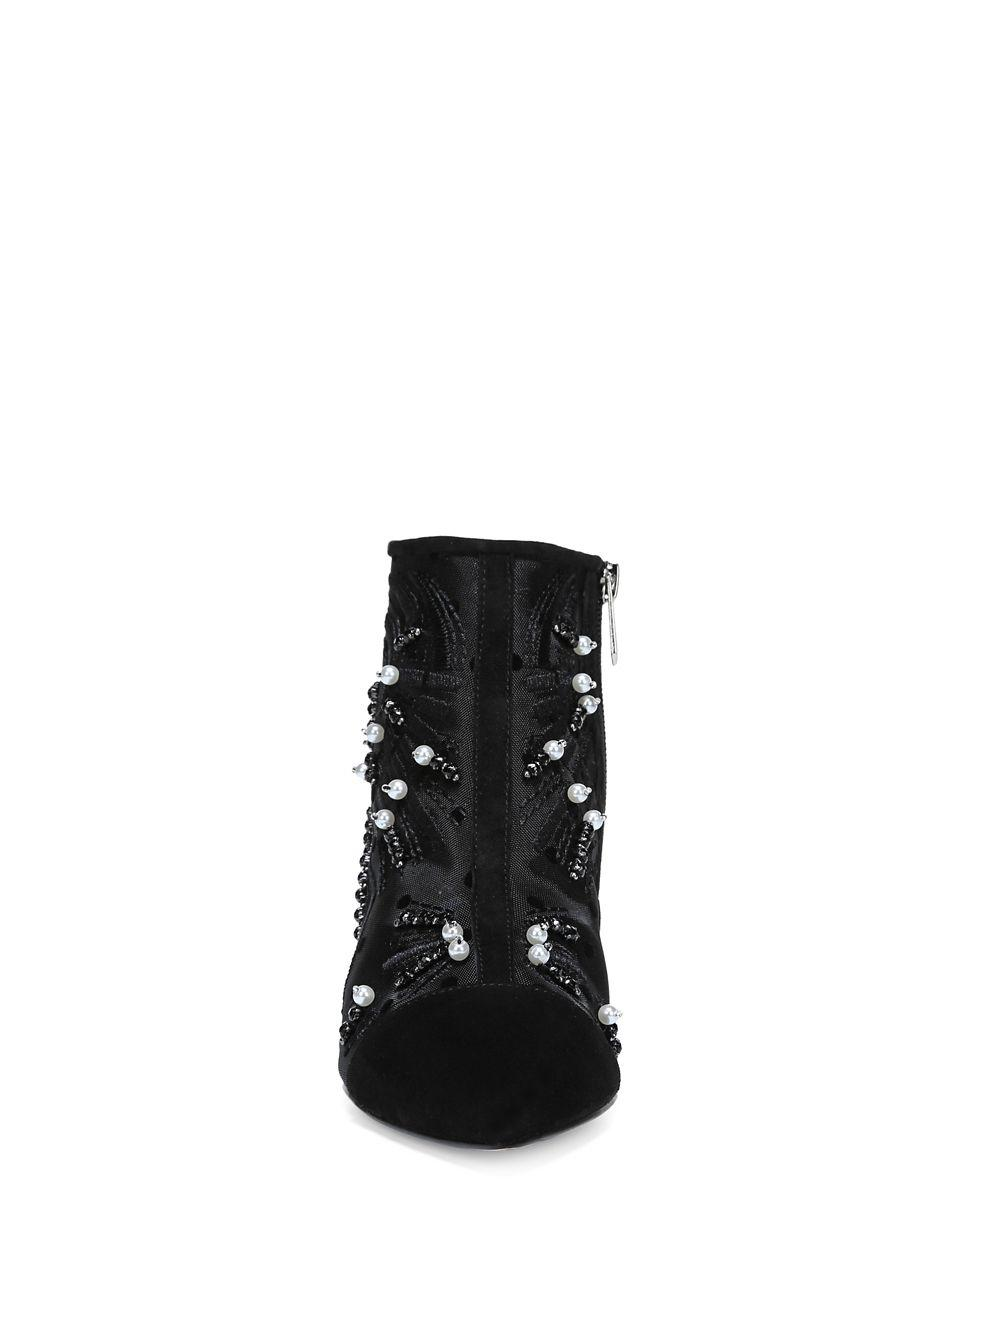 ea0c582703bc76 Sam Edelman - Black Kami Embellished Kitten Heel Booties - Lyst. View  fullscreen